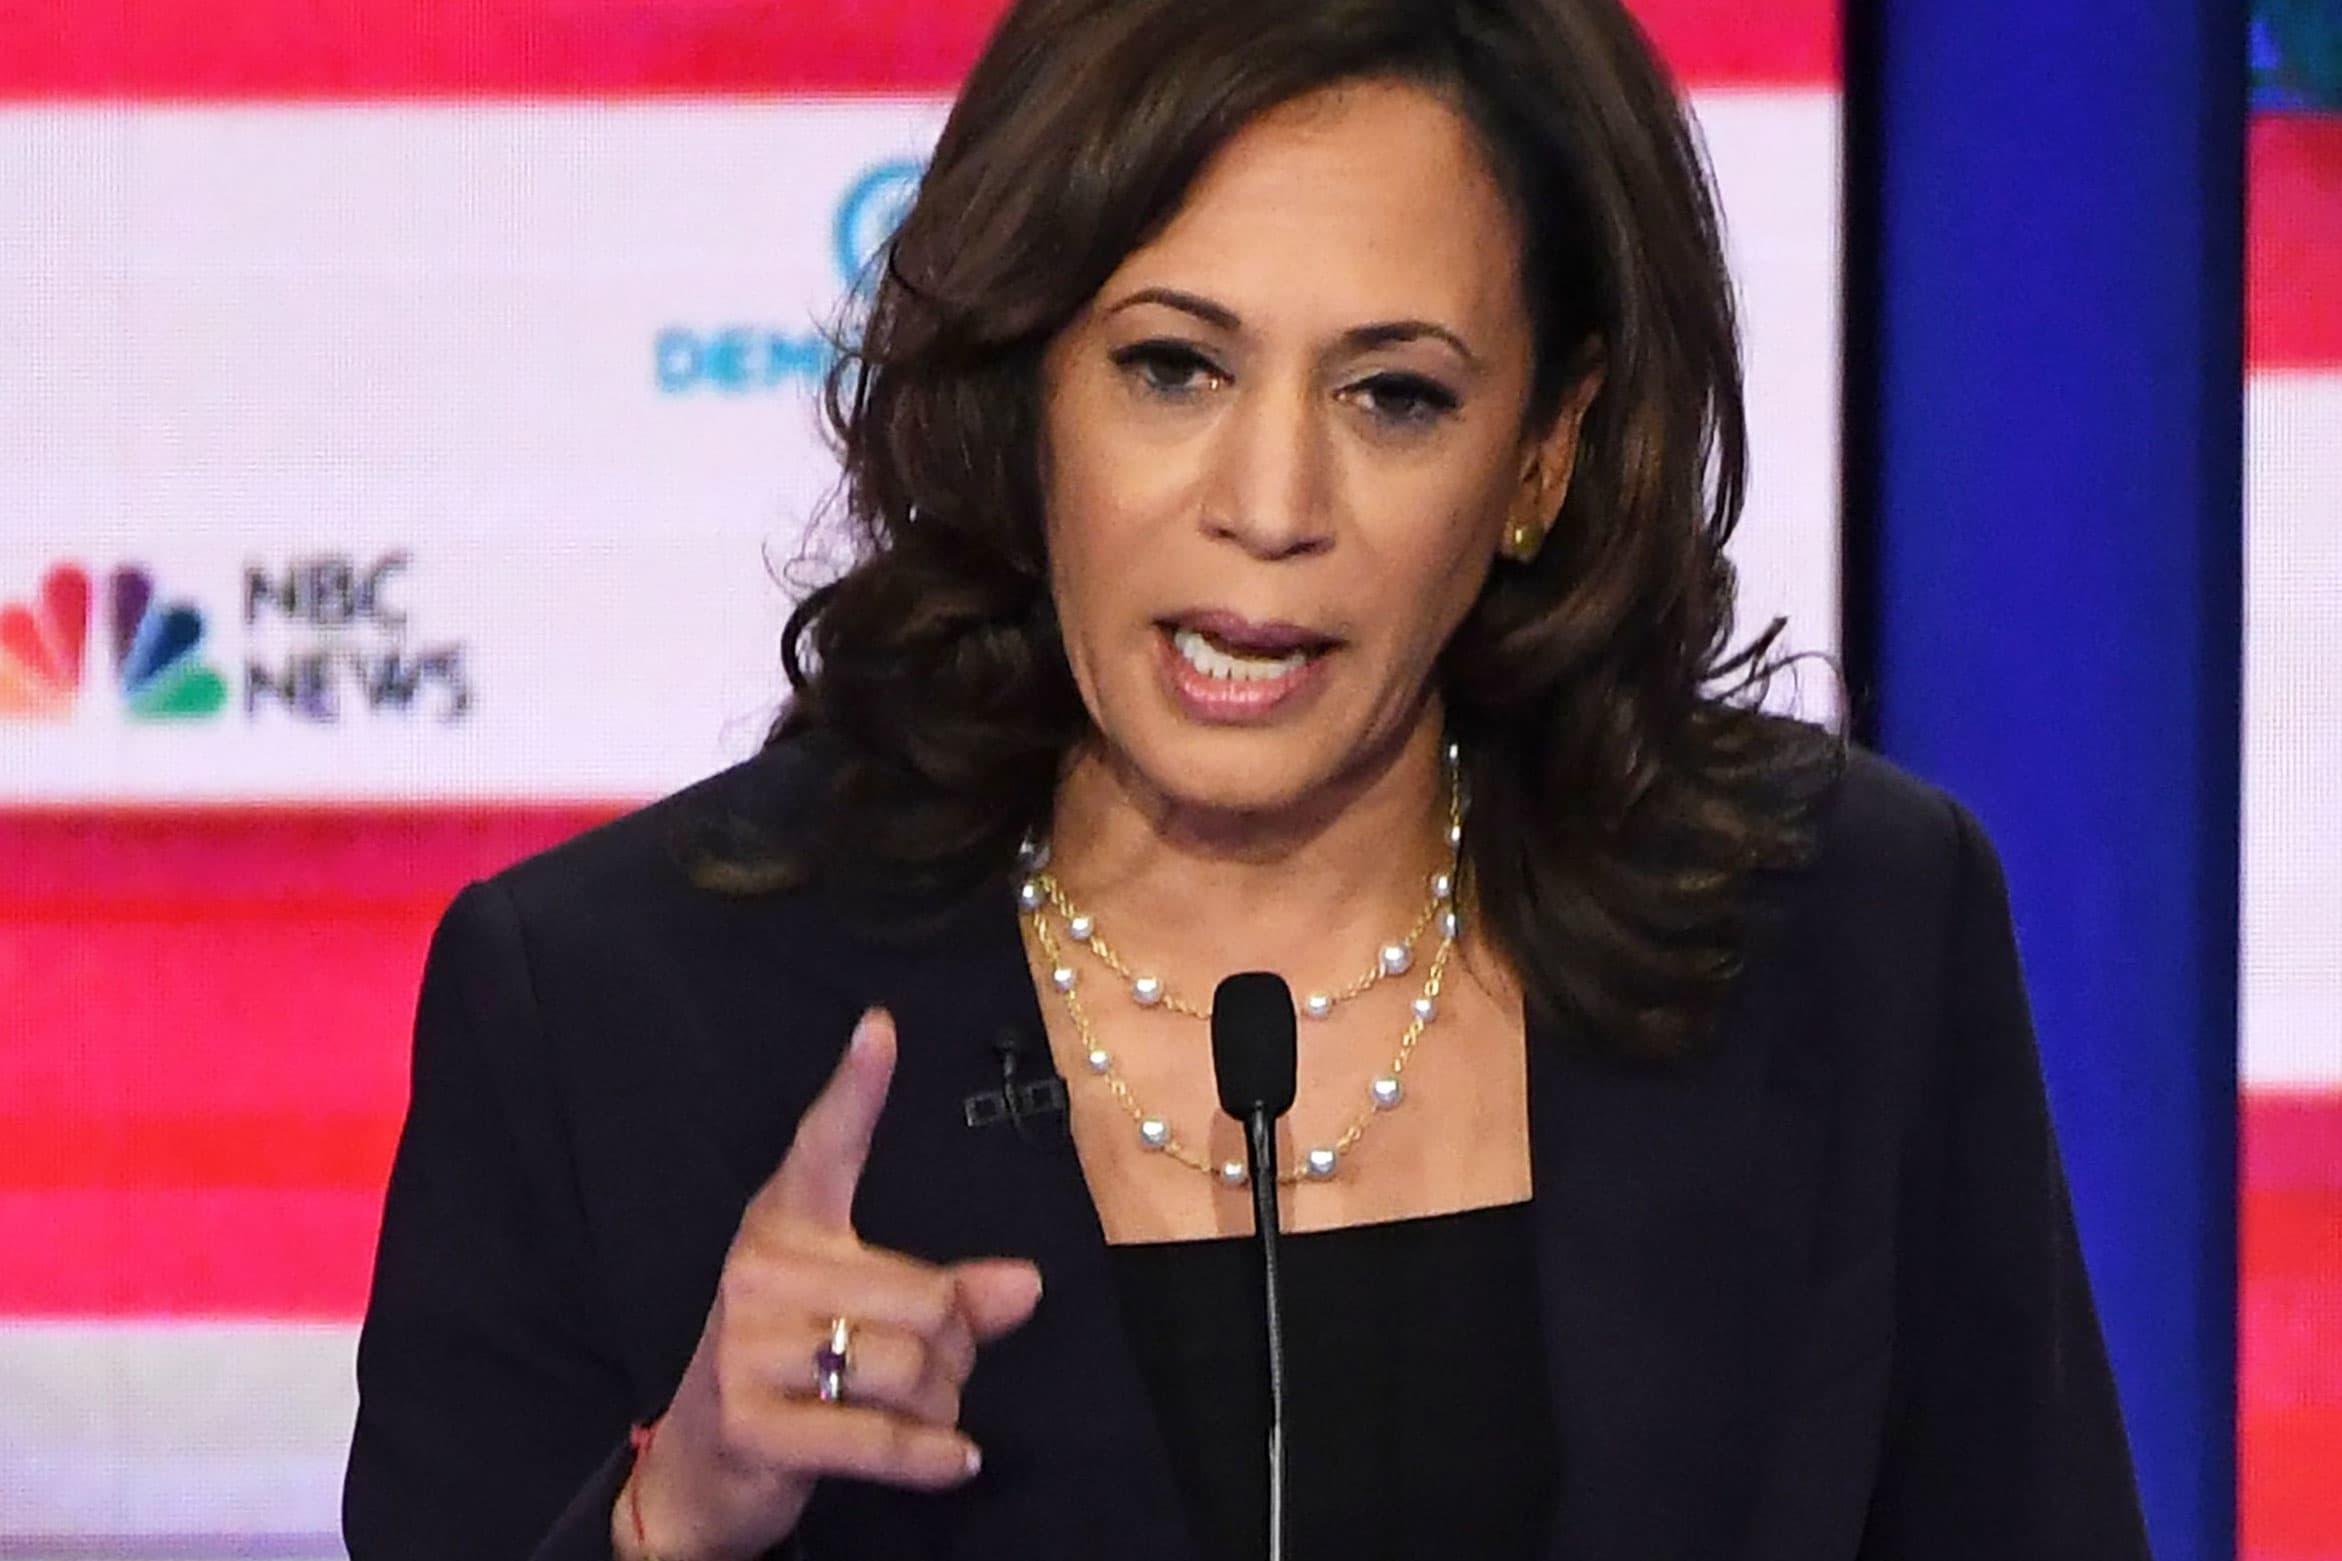 Kamala Harris Joe Biden Busing Battle Could Be Win For Democrats